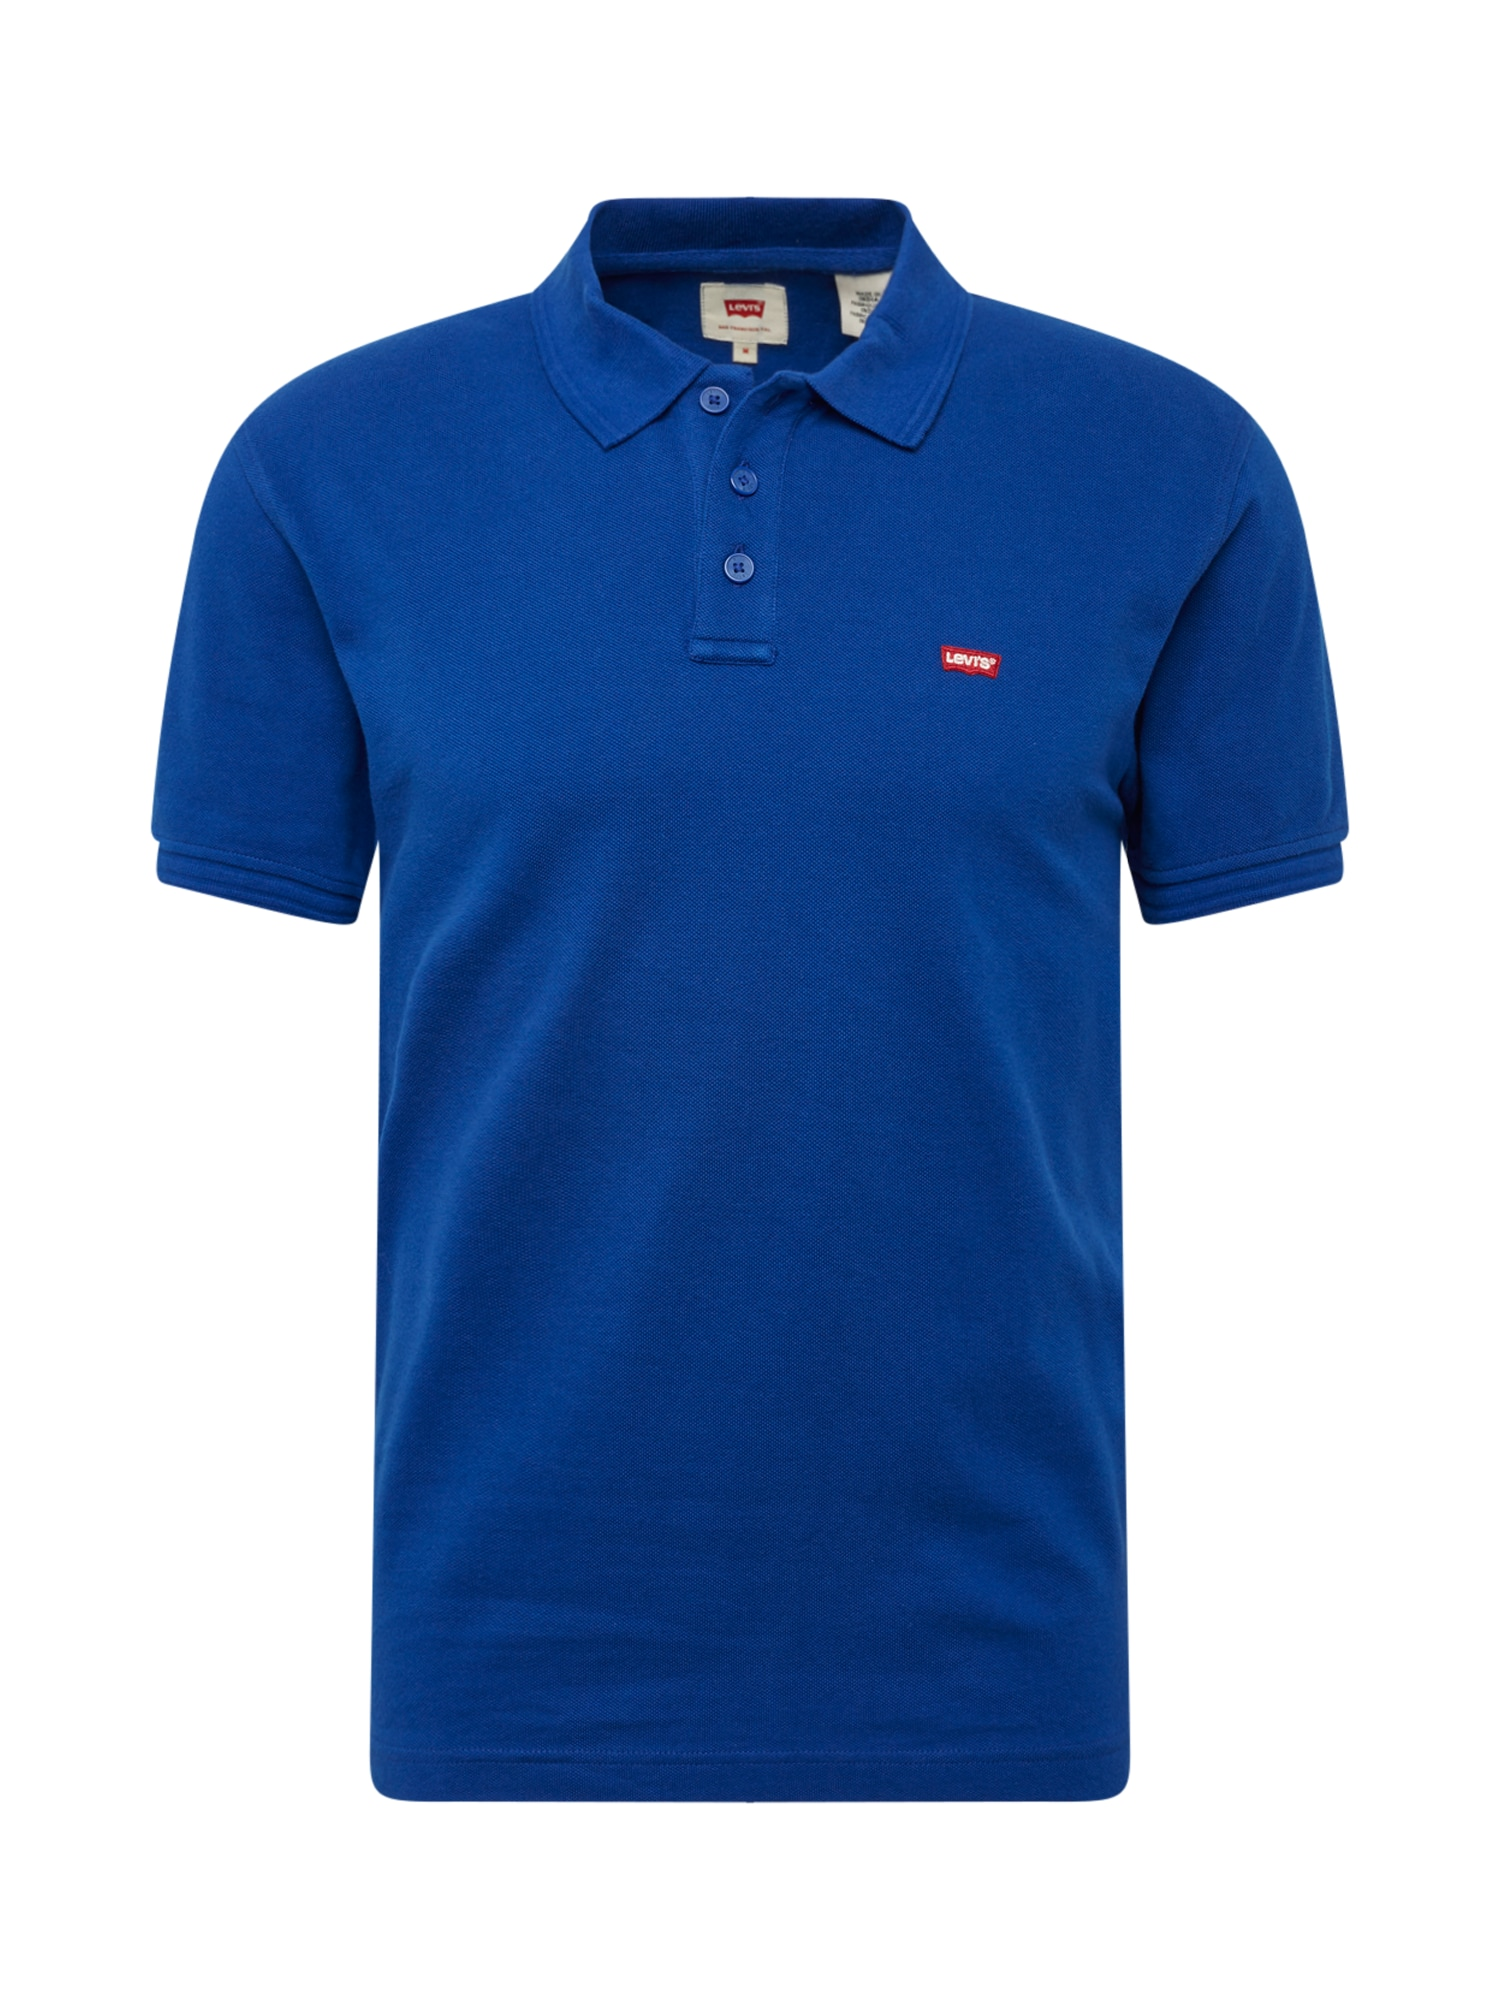 LEVIS Tričko Housemark modrá LEVI'S